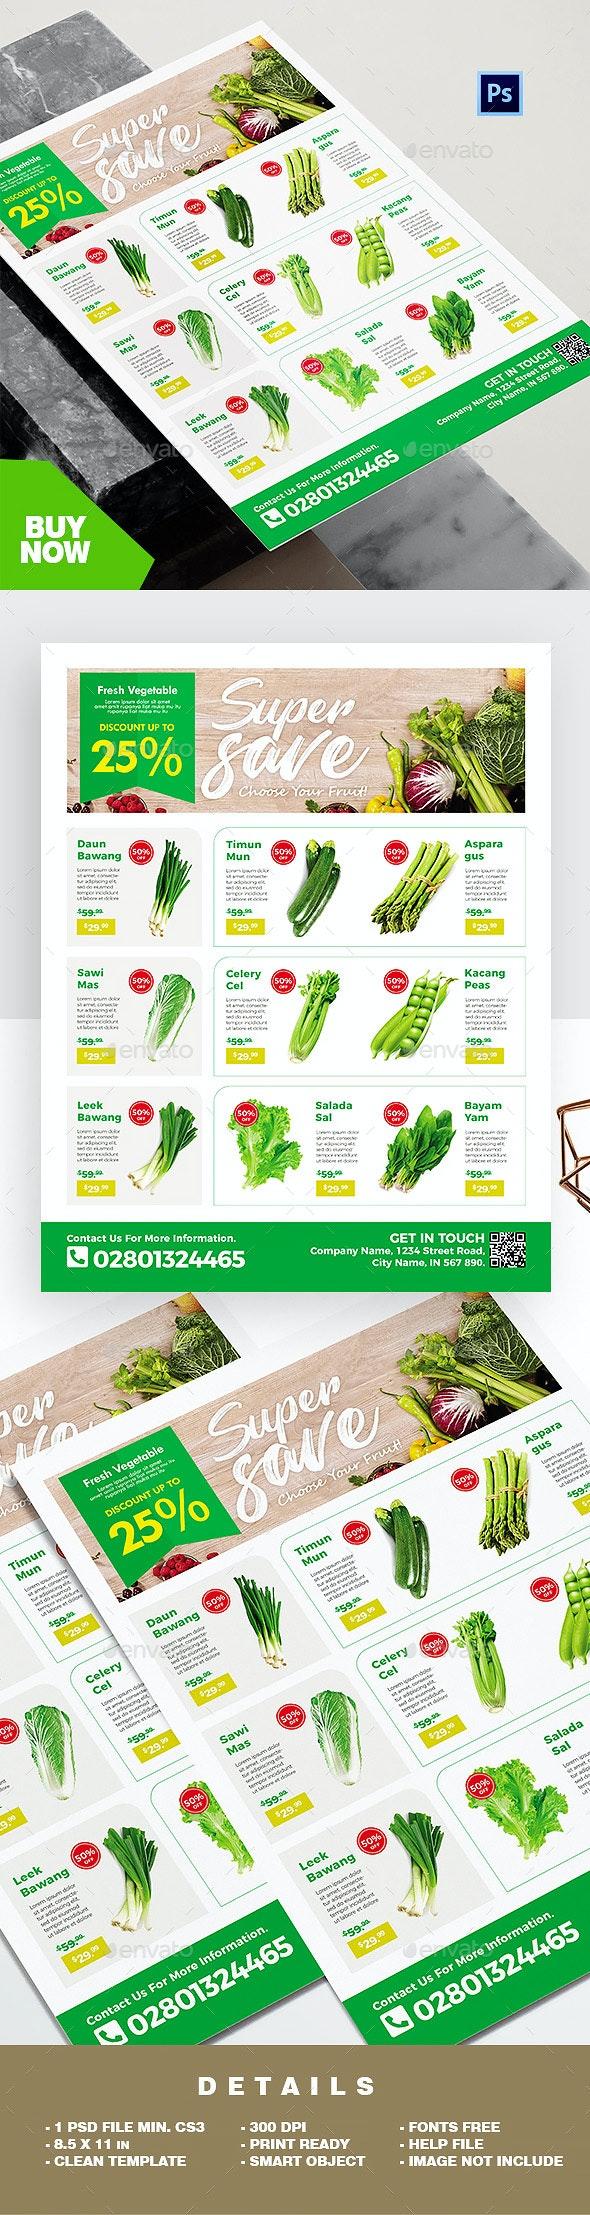 Supermarket Flyer / Fresh Vegetable Product Catalog Flyer - Commerce Flyers